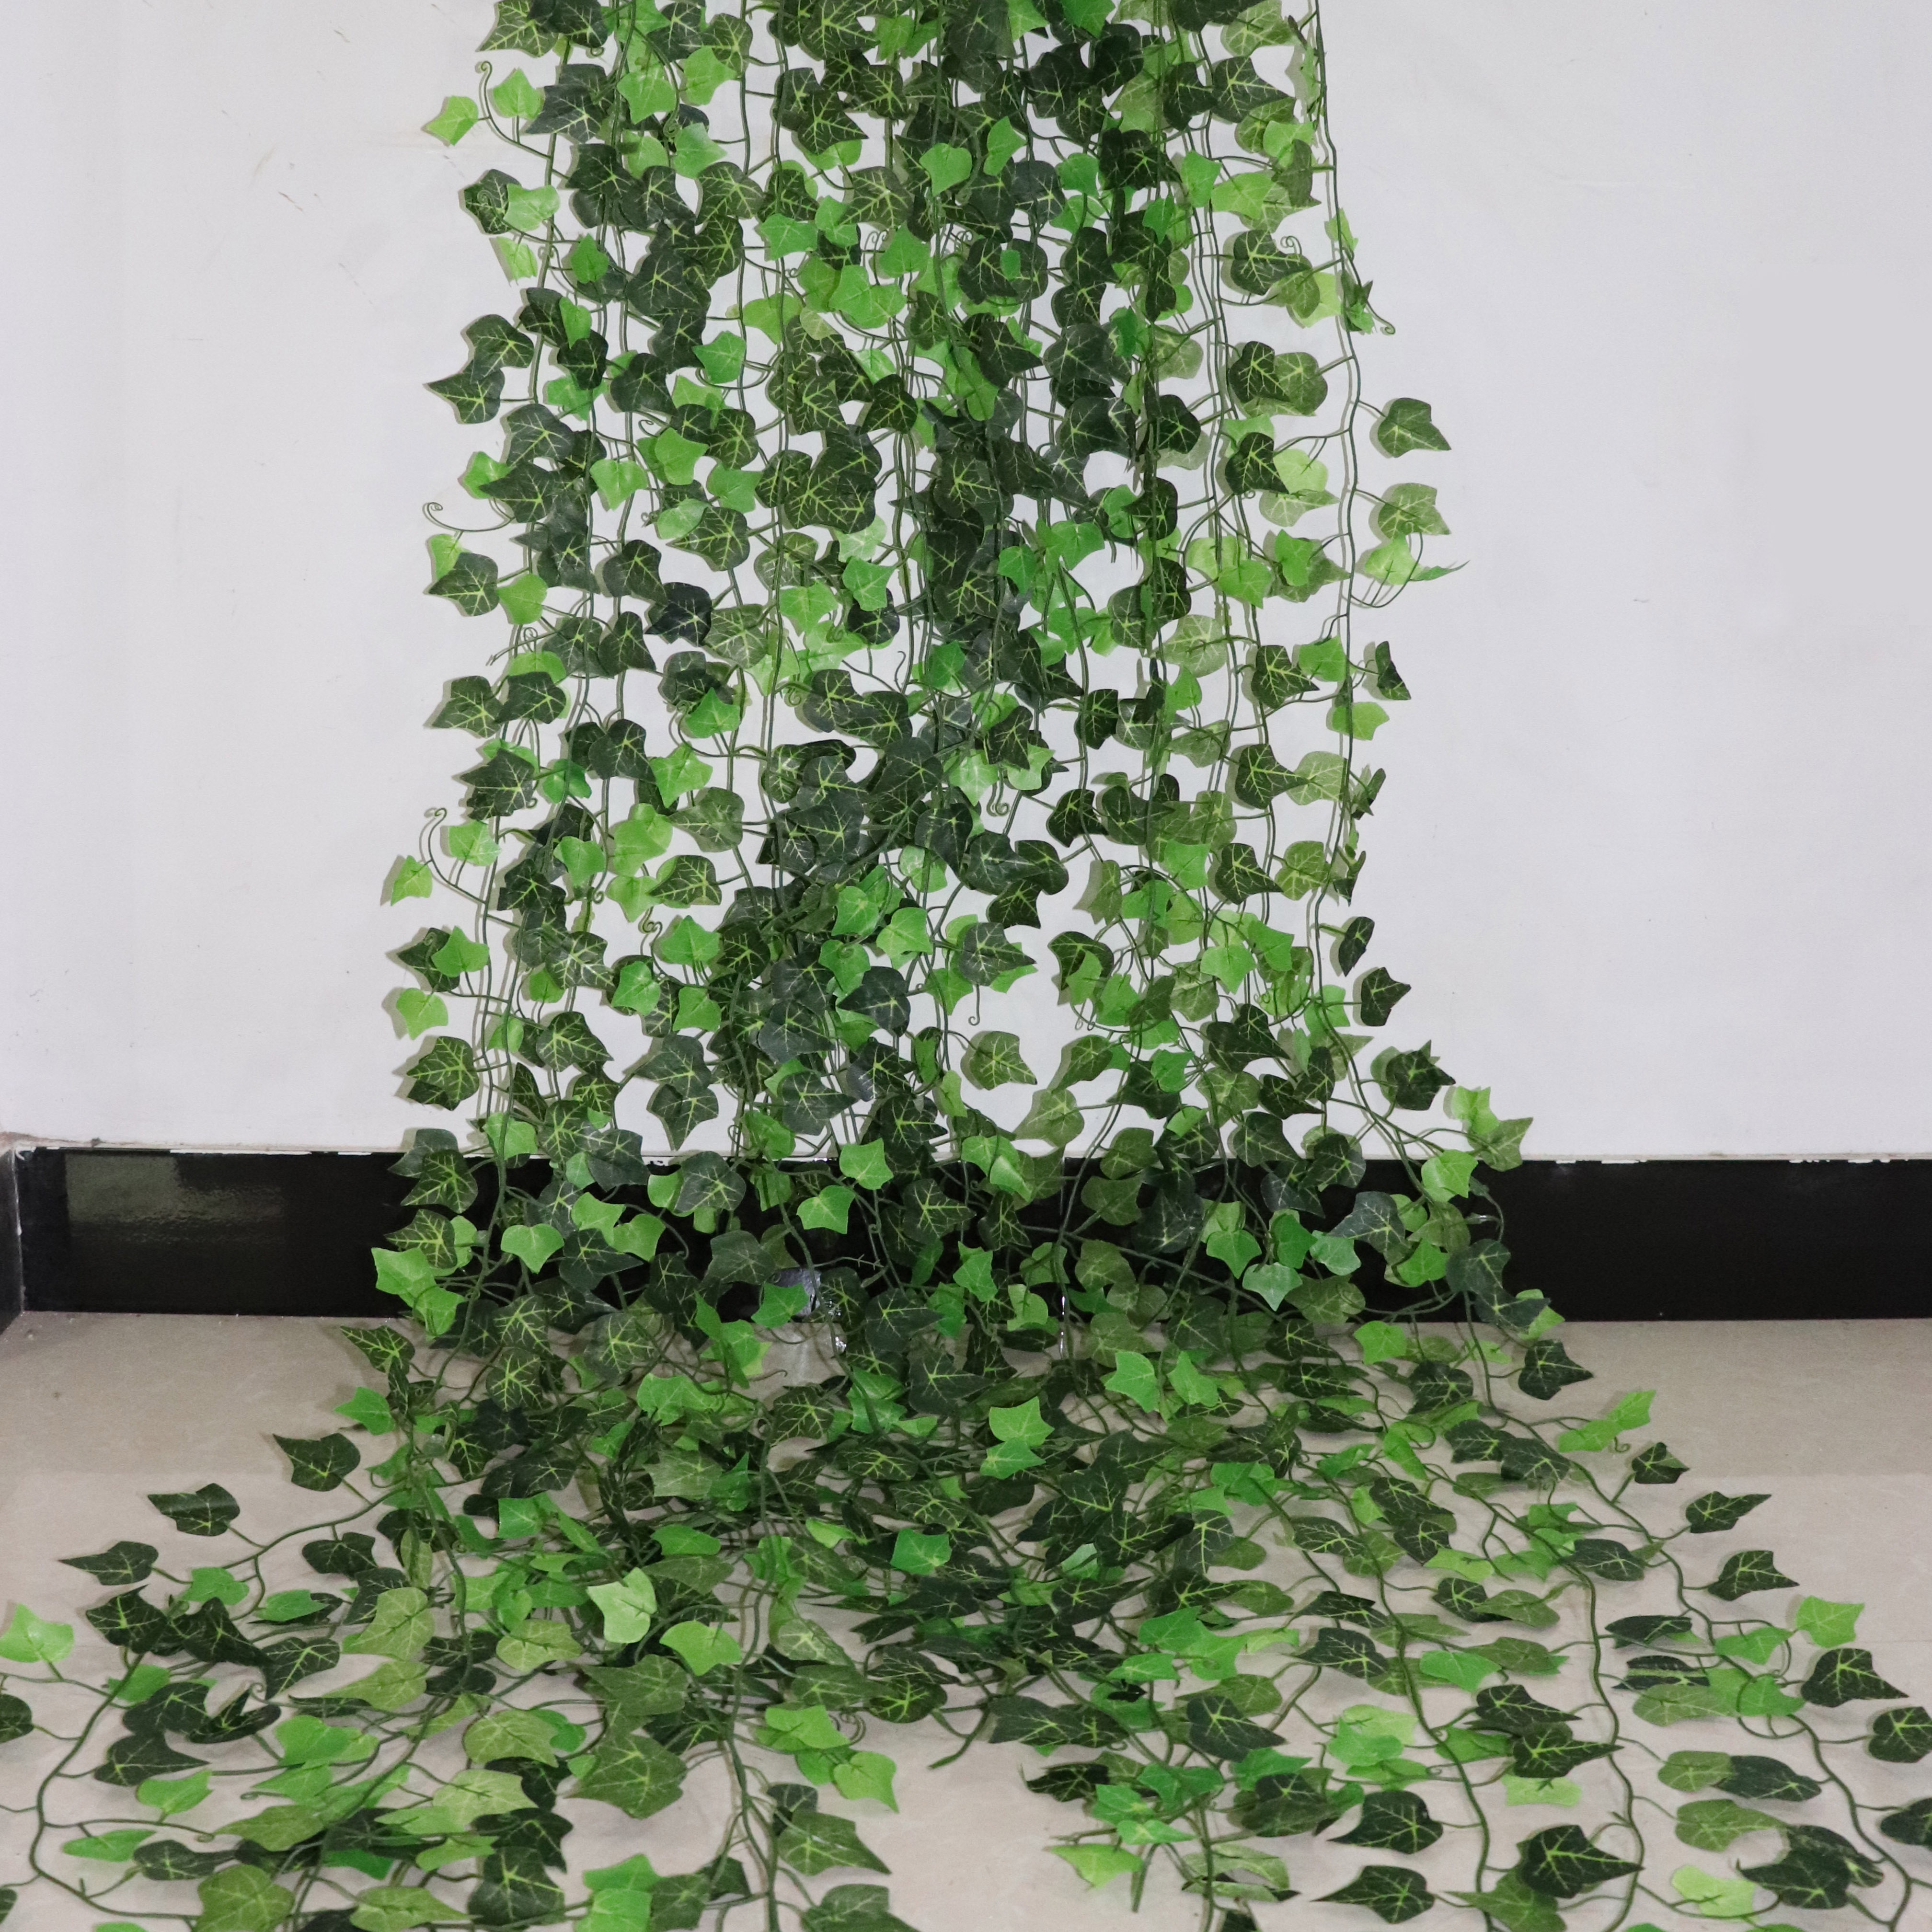 100pcs Leaf 1 piece 2.4M Home Decor Artificial Ivy Leaf Garland Plants Vine Fake Foliage Flowers Creeper Green Ivy Wreath 1